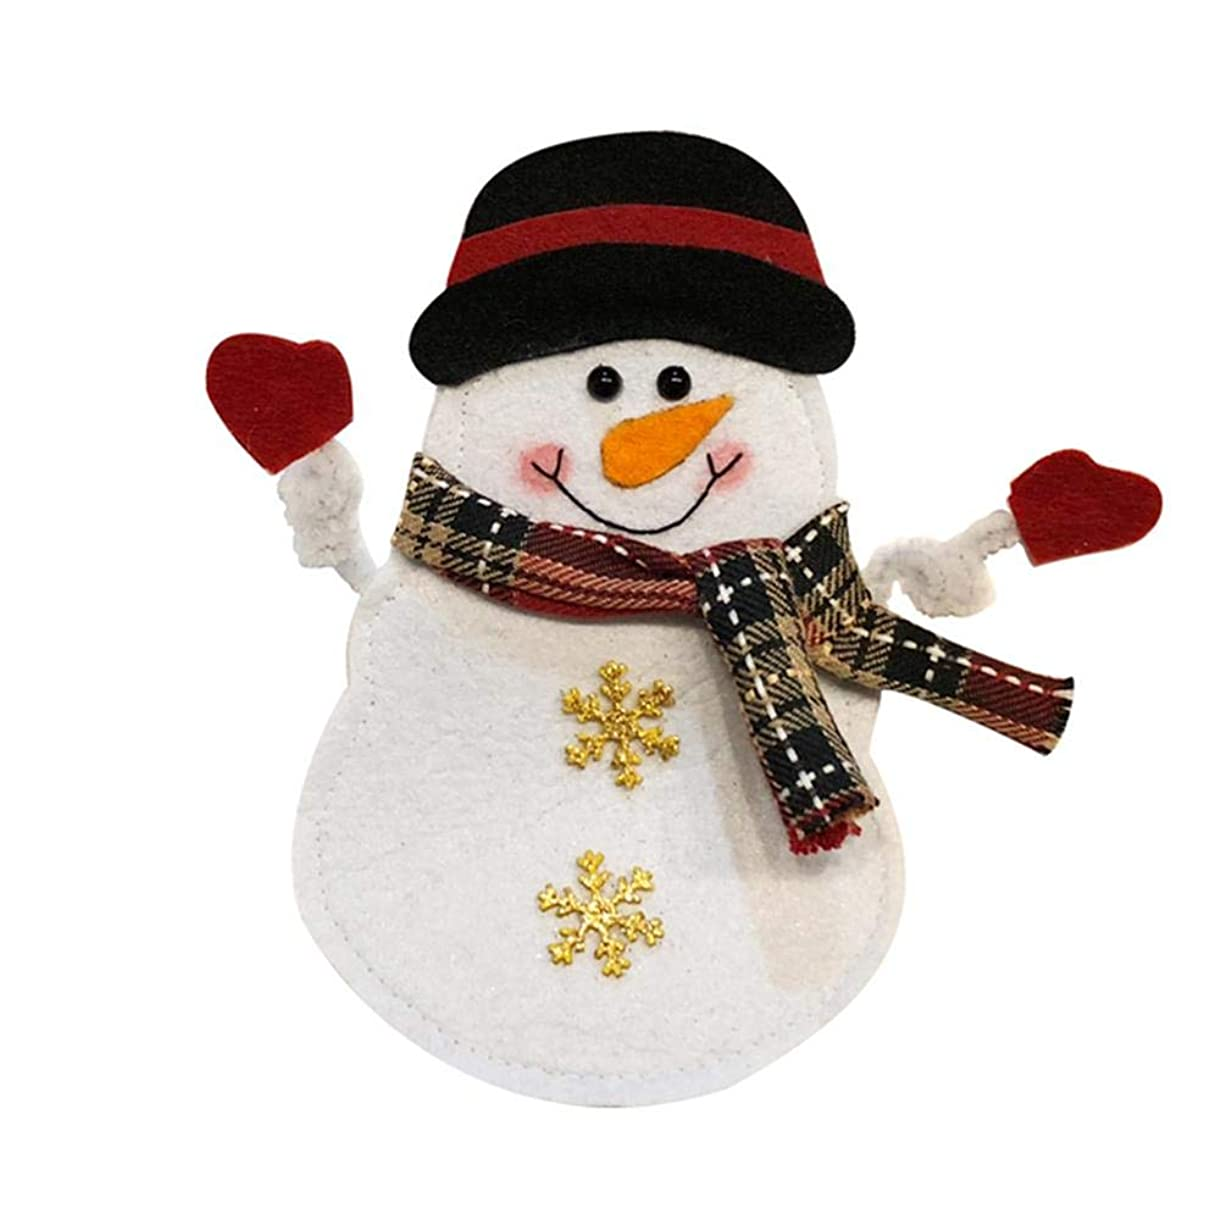 shuiyxingjp ナイフ フォーク バッグ 食器カバー クリスマス カトラリーバッグ ナイフ フォーク カバー 可愛い クリスマス 飾り プレゼント クリスマスツリー 装飾 サンタクロース 雪だるま エルク パーティー デコレーション ホーム ダイニング ルーム